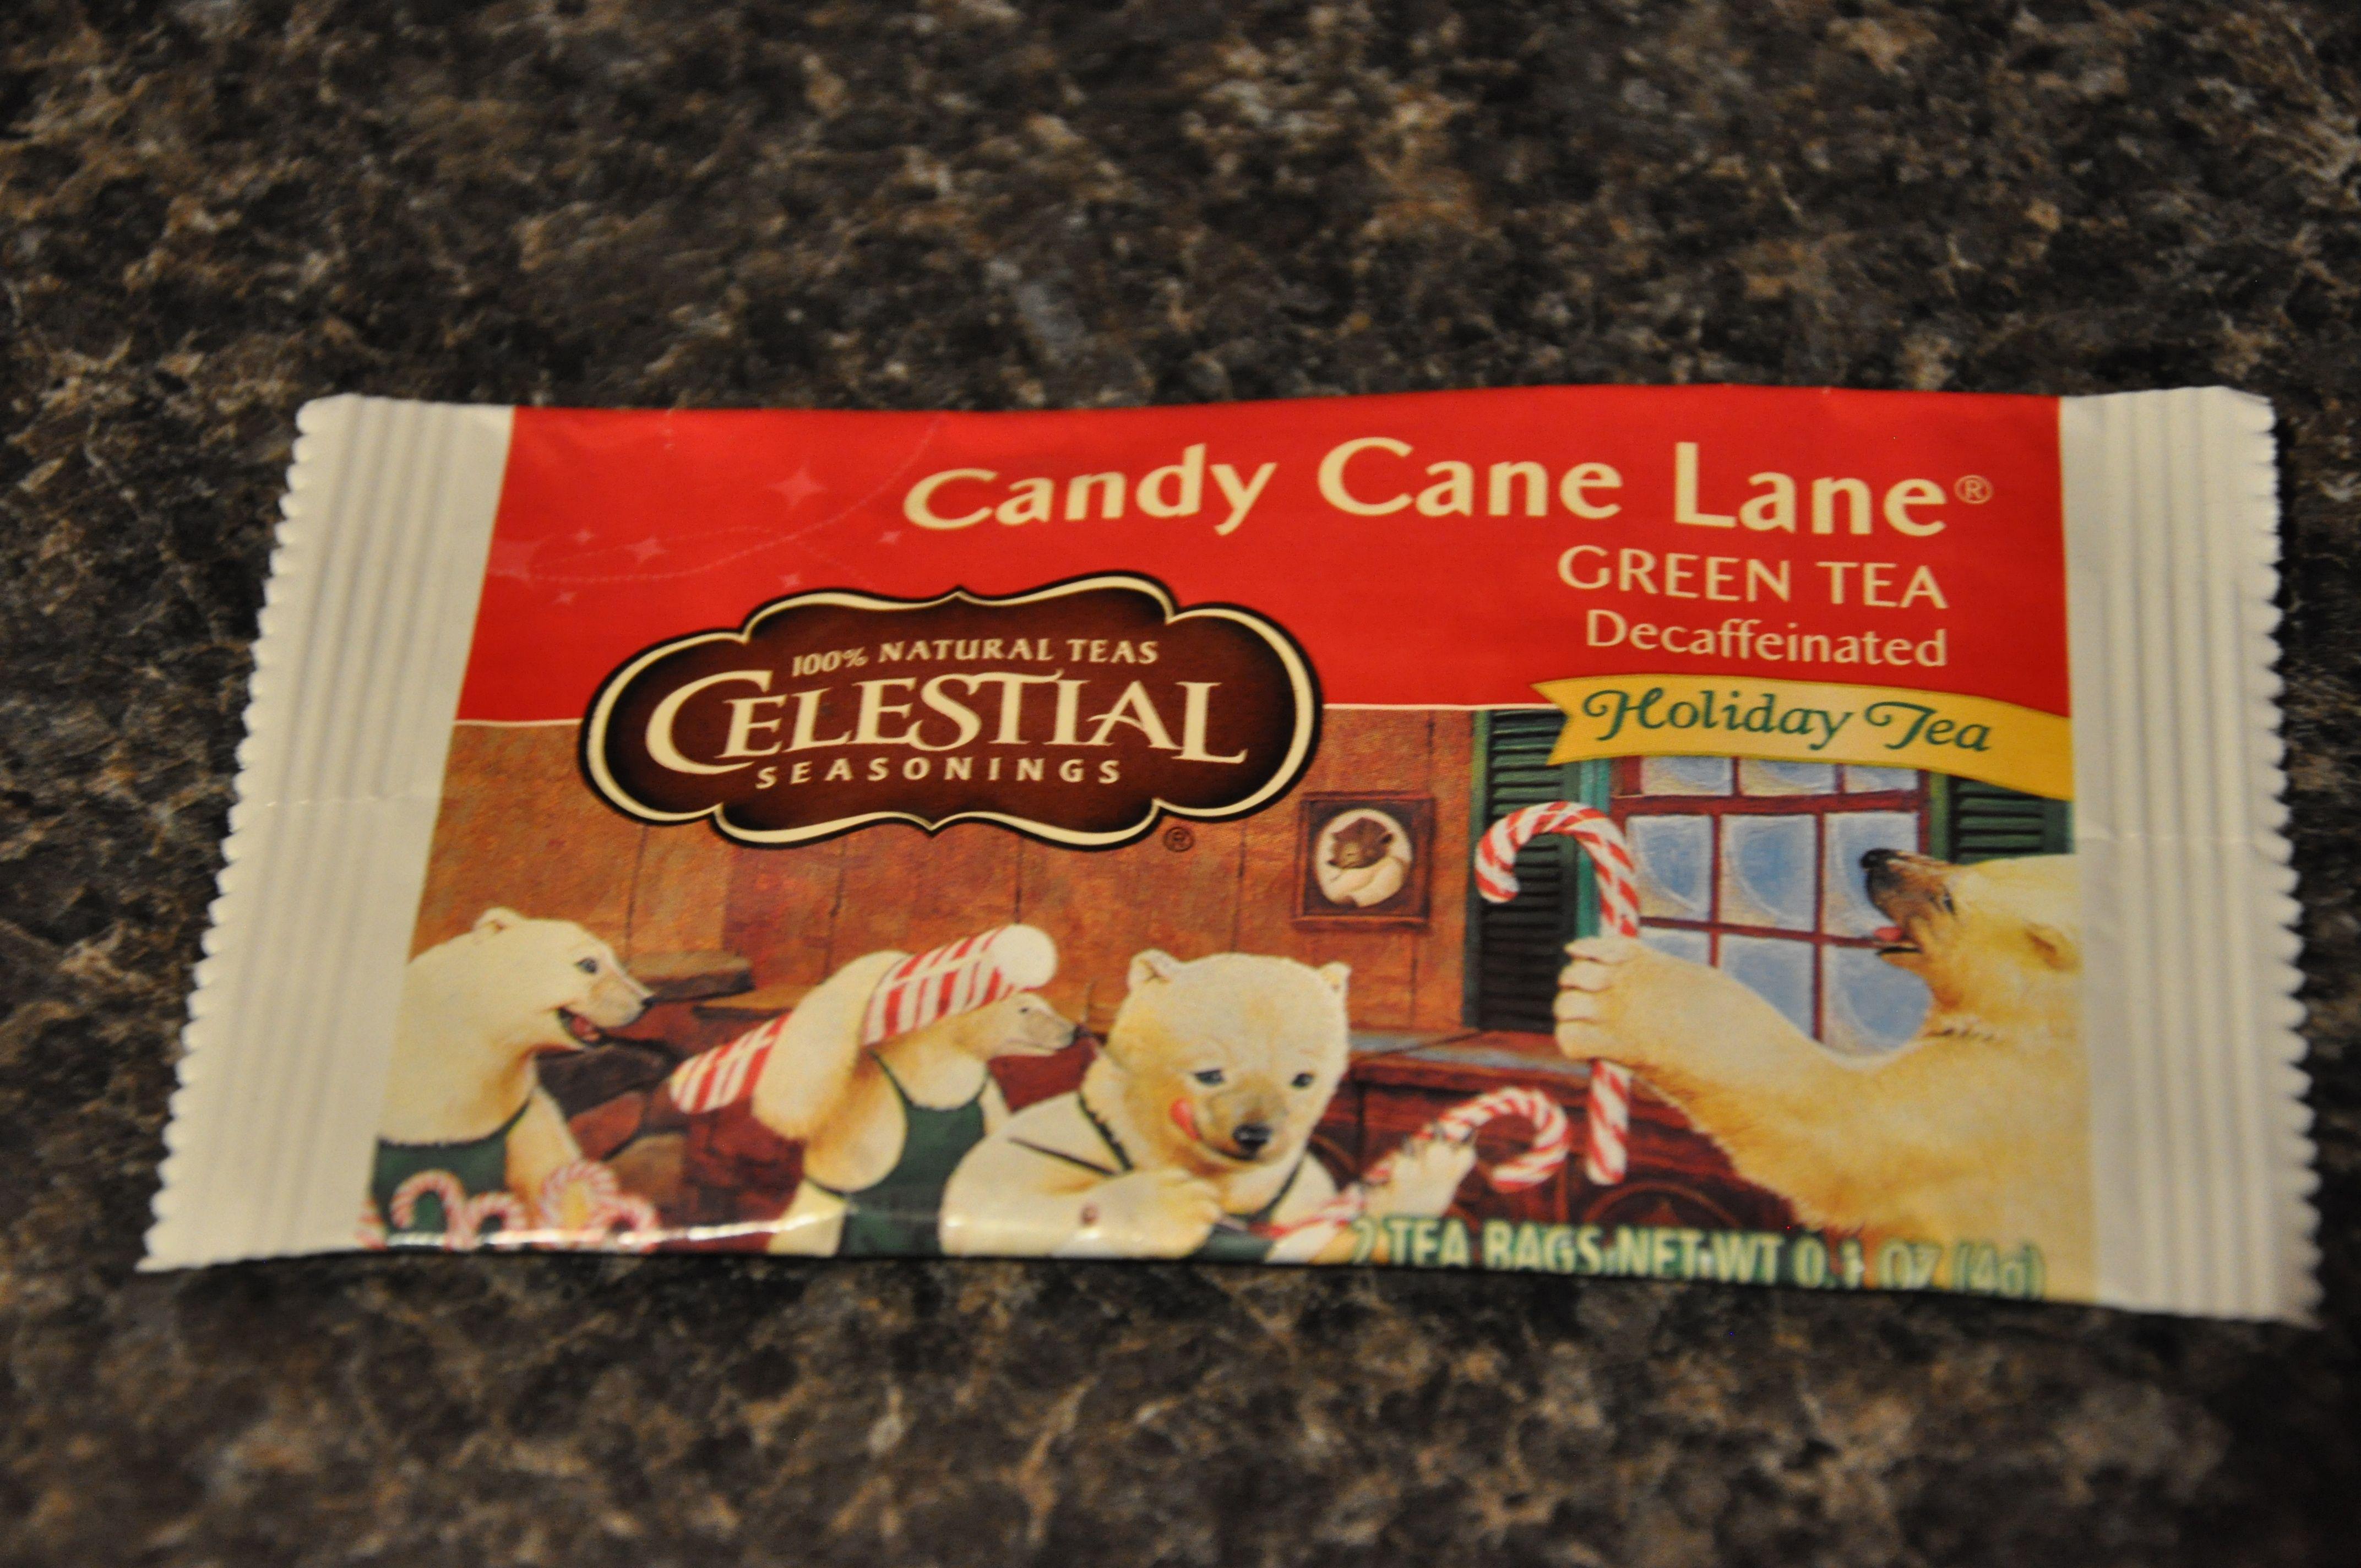 Celestial Seasonings Candy Cane Lane Green Tea